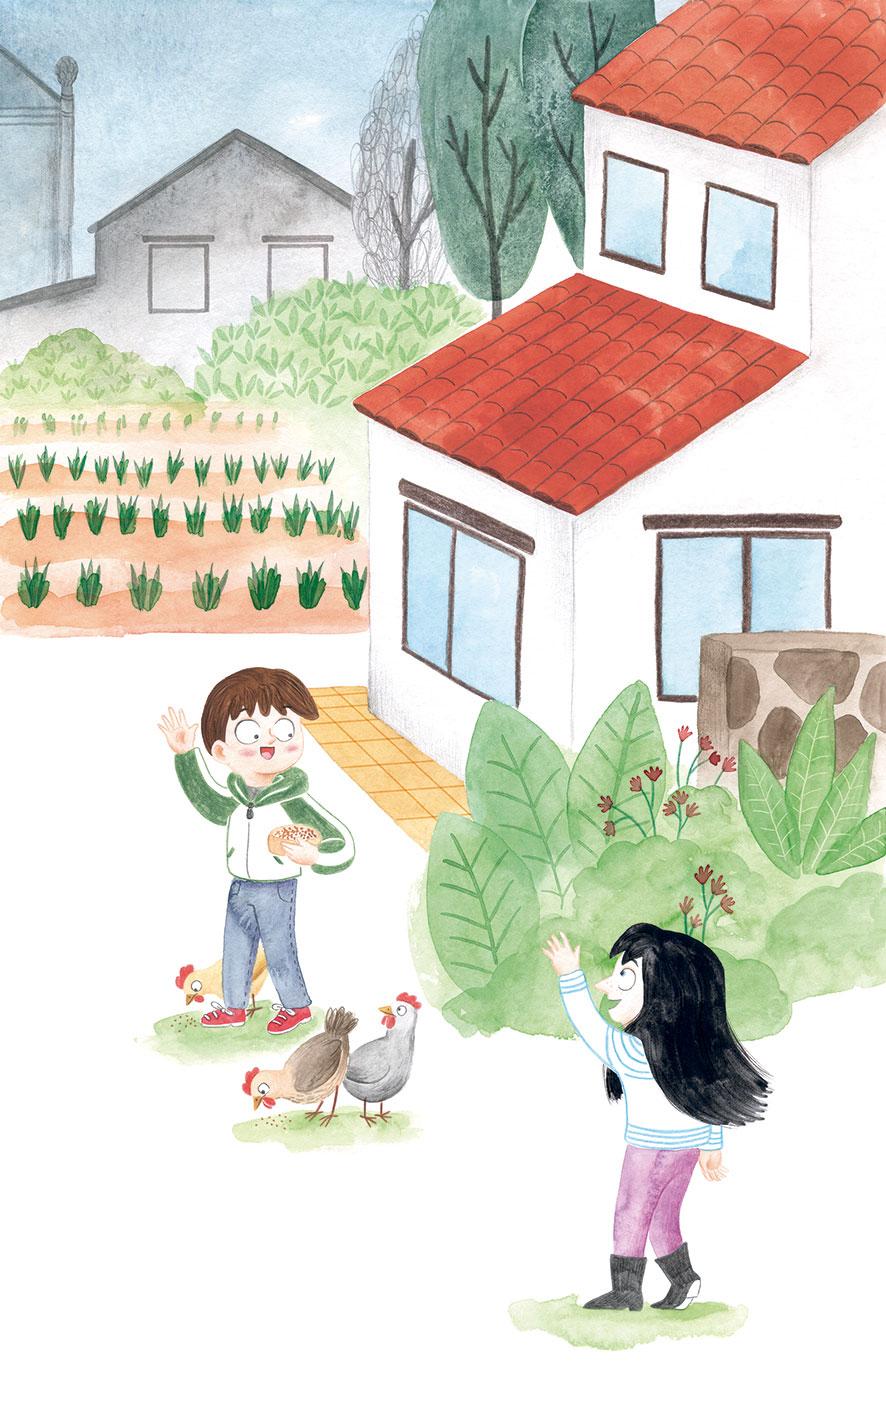 O misterio dos fillos de Lúa, SM, Xerme, El Barco de Vapor, serie naranja, Fina Casalderrey, ilustración con niños, ilustración infantil,